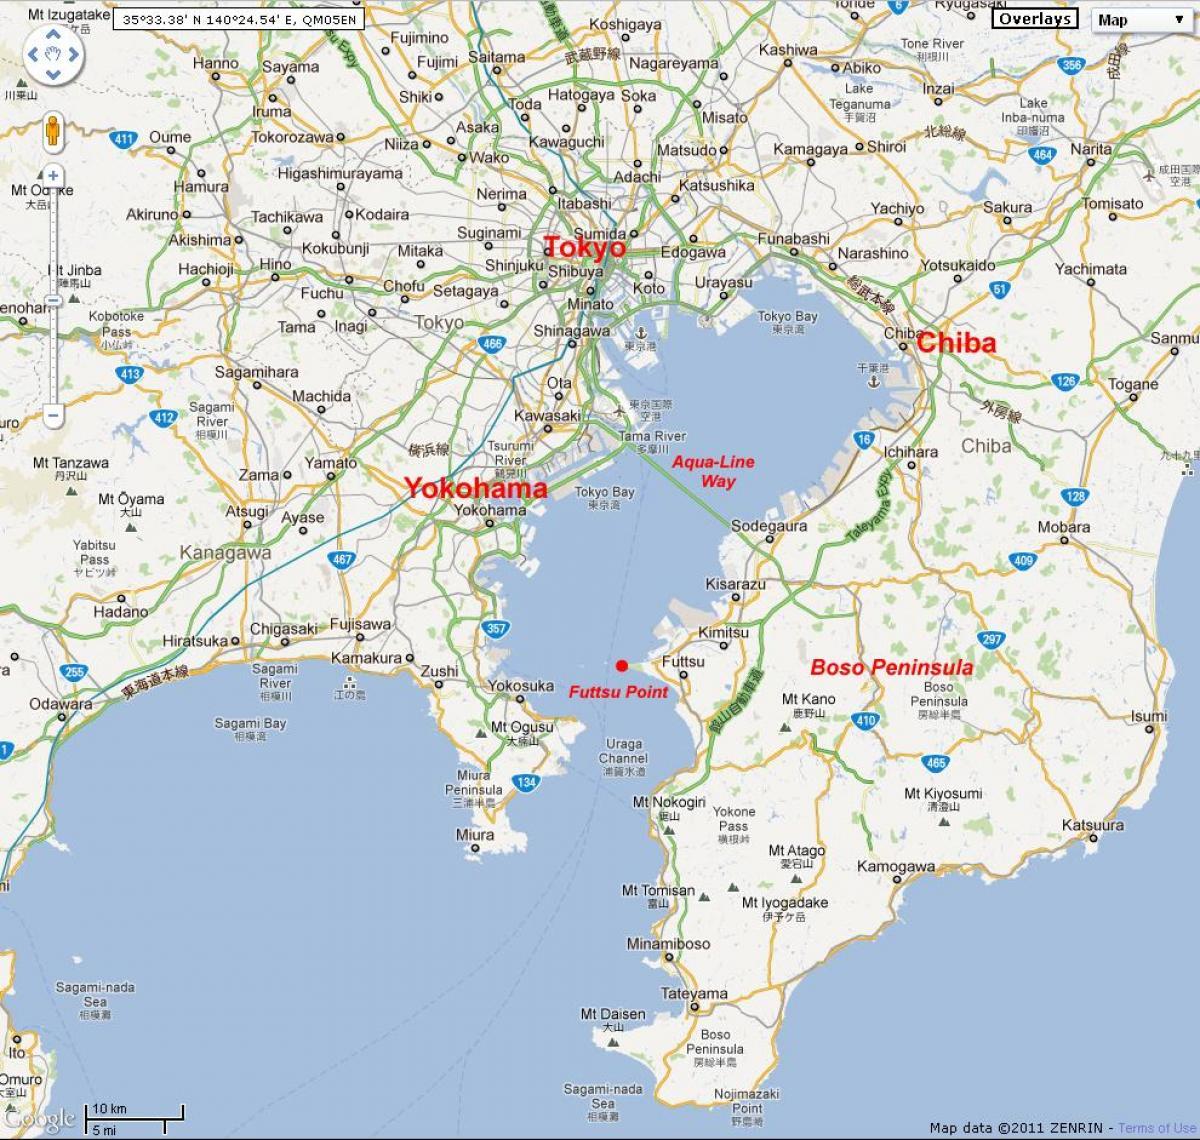 Present-day Tokyo Bay, Japan